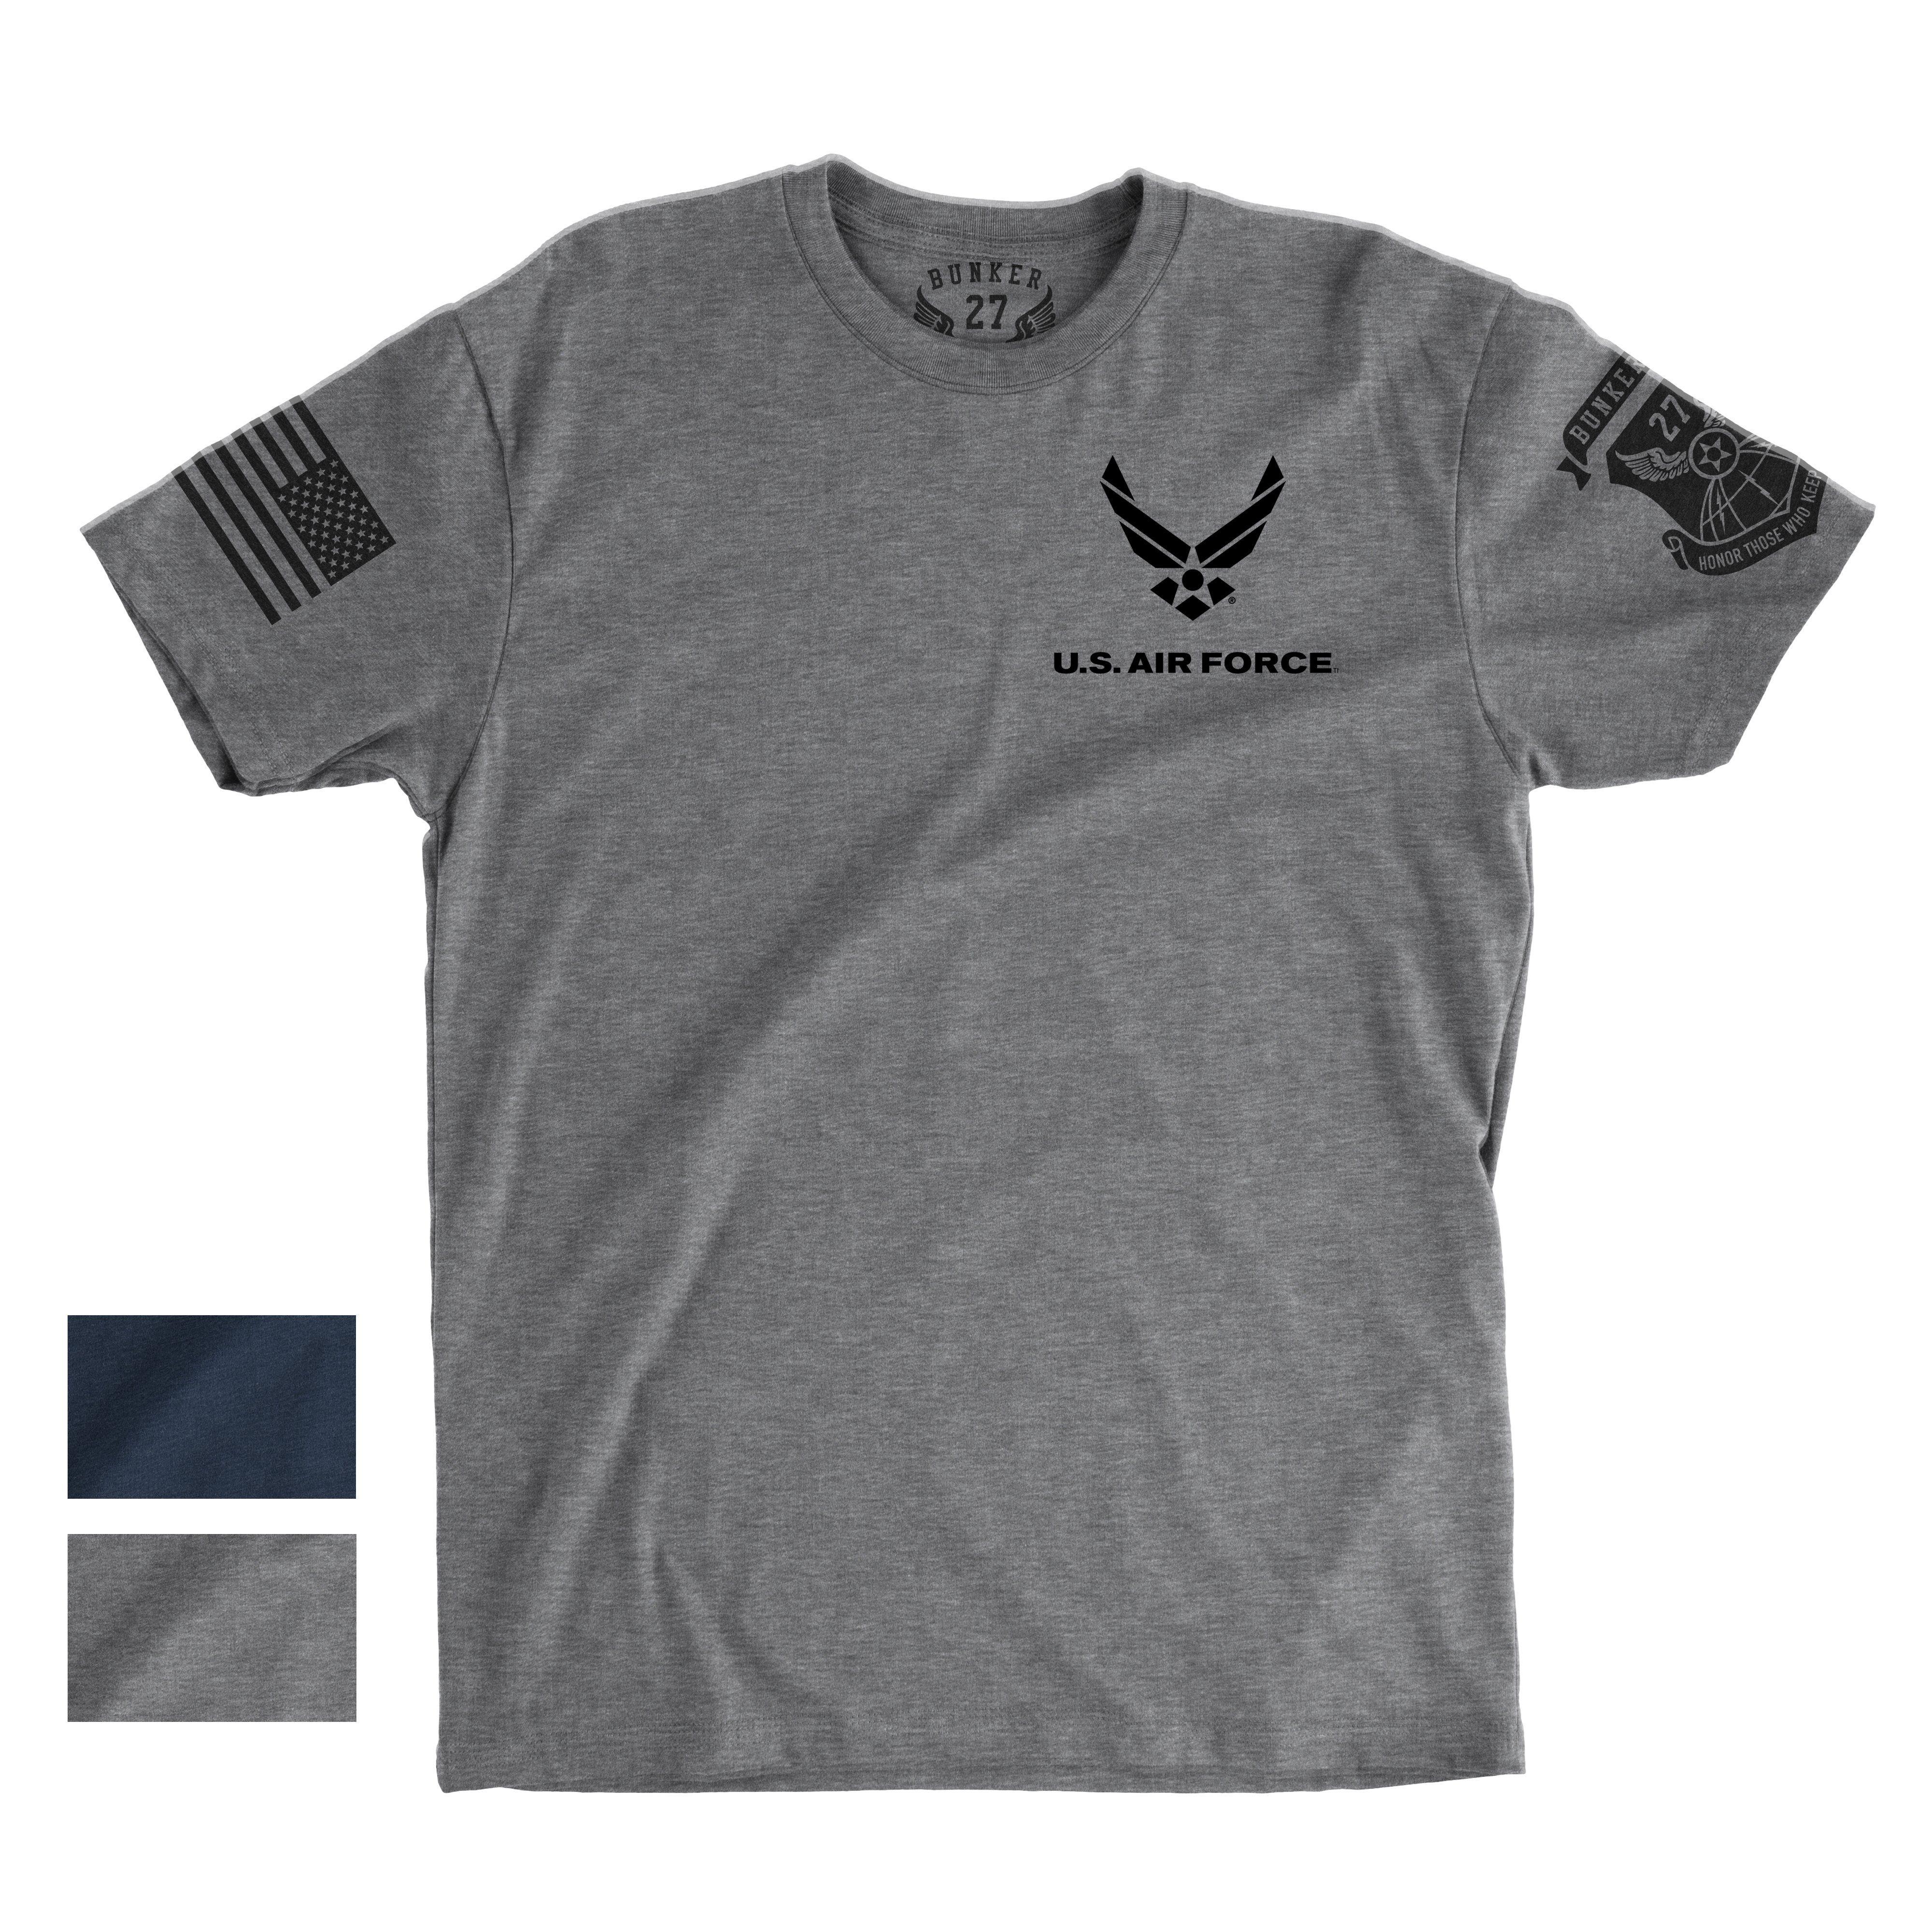 Official U.S. Air Force Logo TShirt Air force clothing